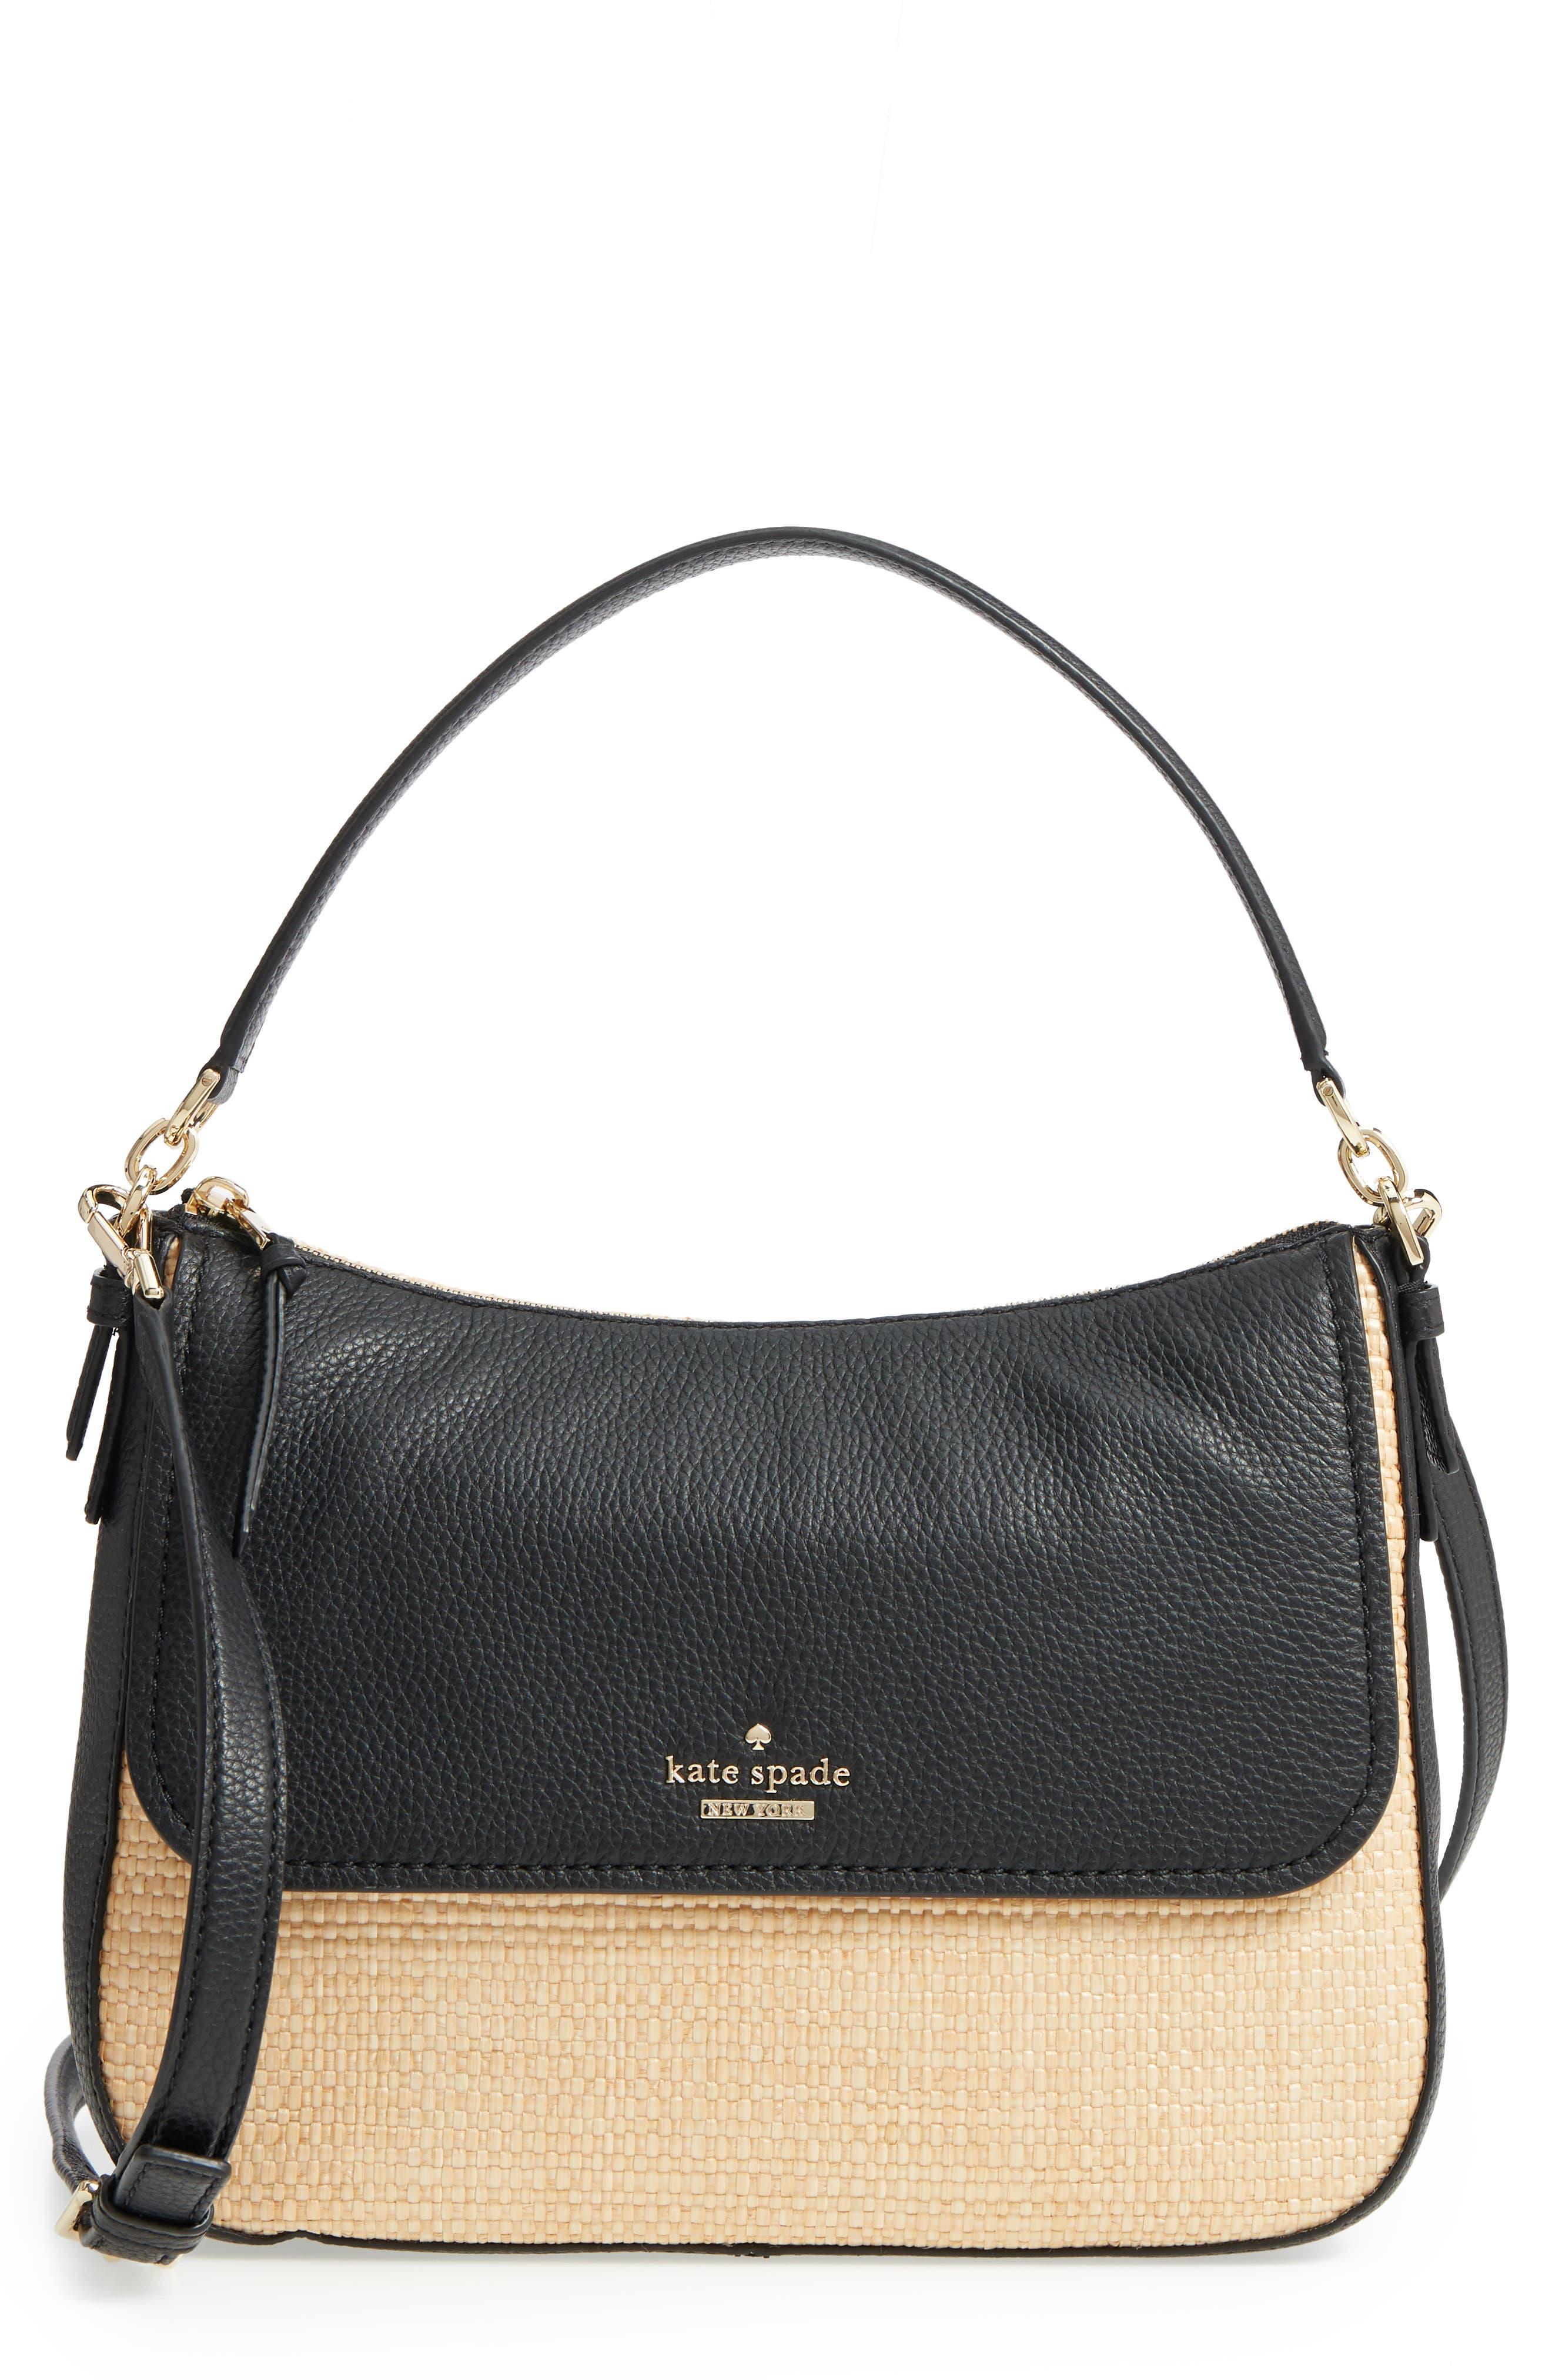 KATE SPADE NEW YORK jackson street - colette straw & leather satchel, Main, color, 257